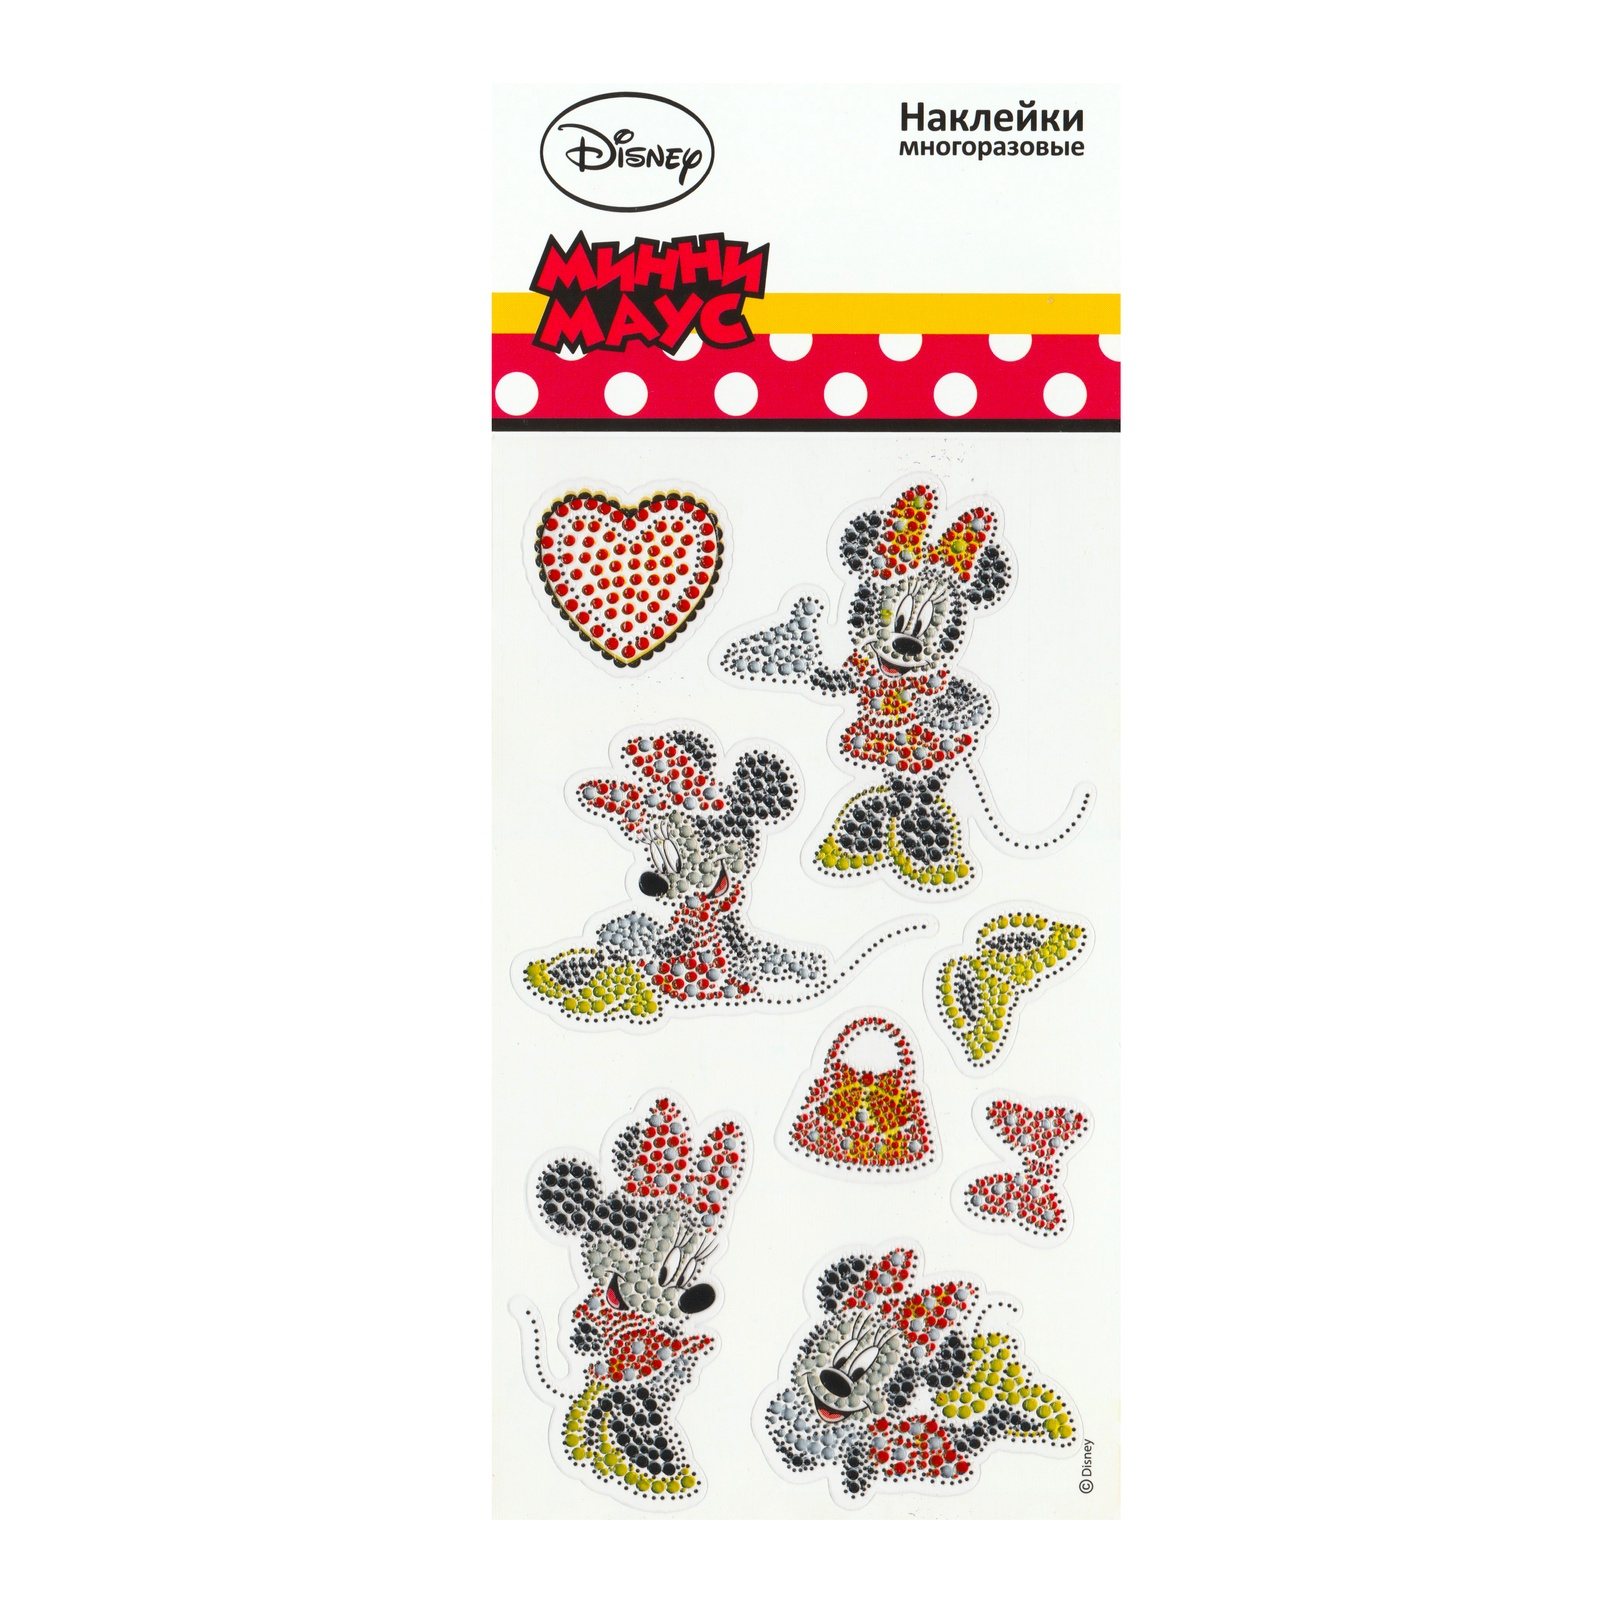 Набор наклеек Disney Стразы многоразовые Минни Маус цена